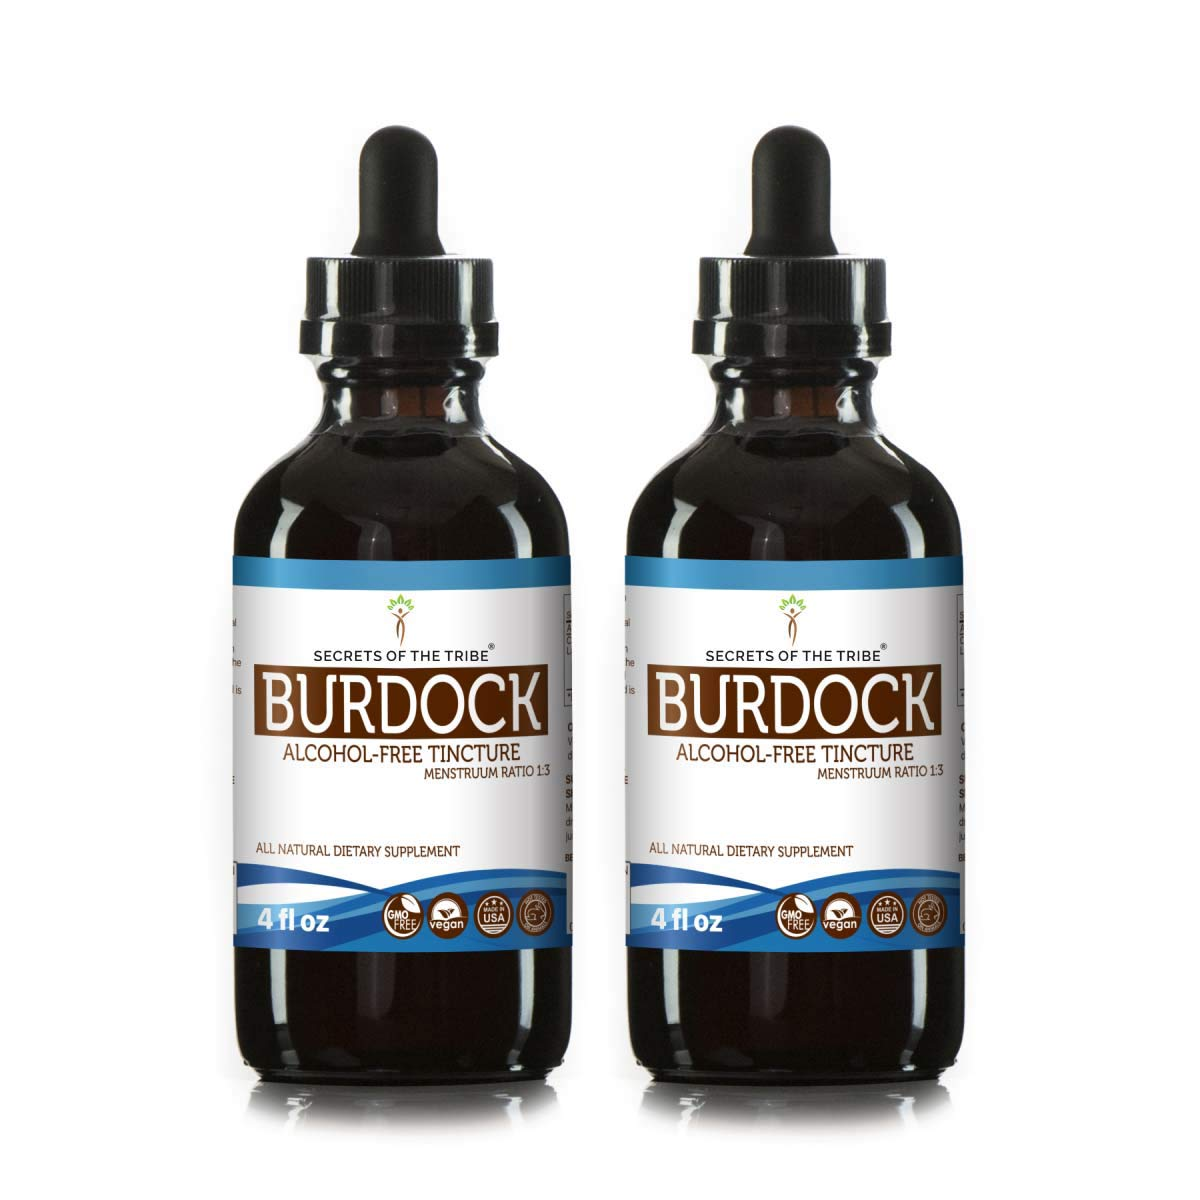 Burdock Tincture Alcohol-Free Liquid Extract, Organic Burdock (Arctium Lappa) Dried Root (2x4 FL OZ) by Secrets of the Tribe